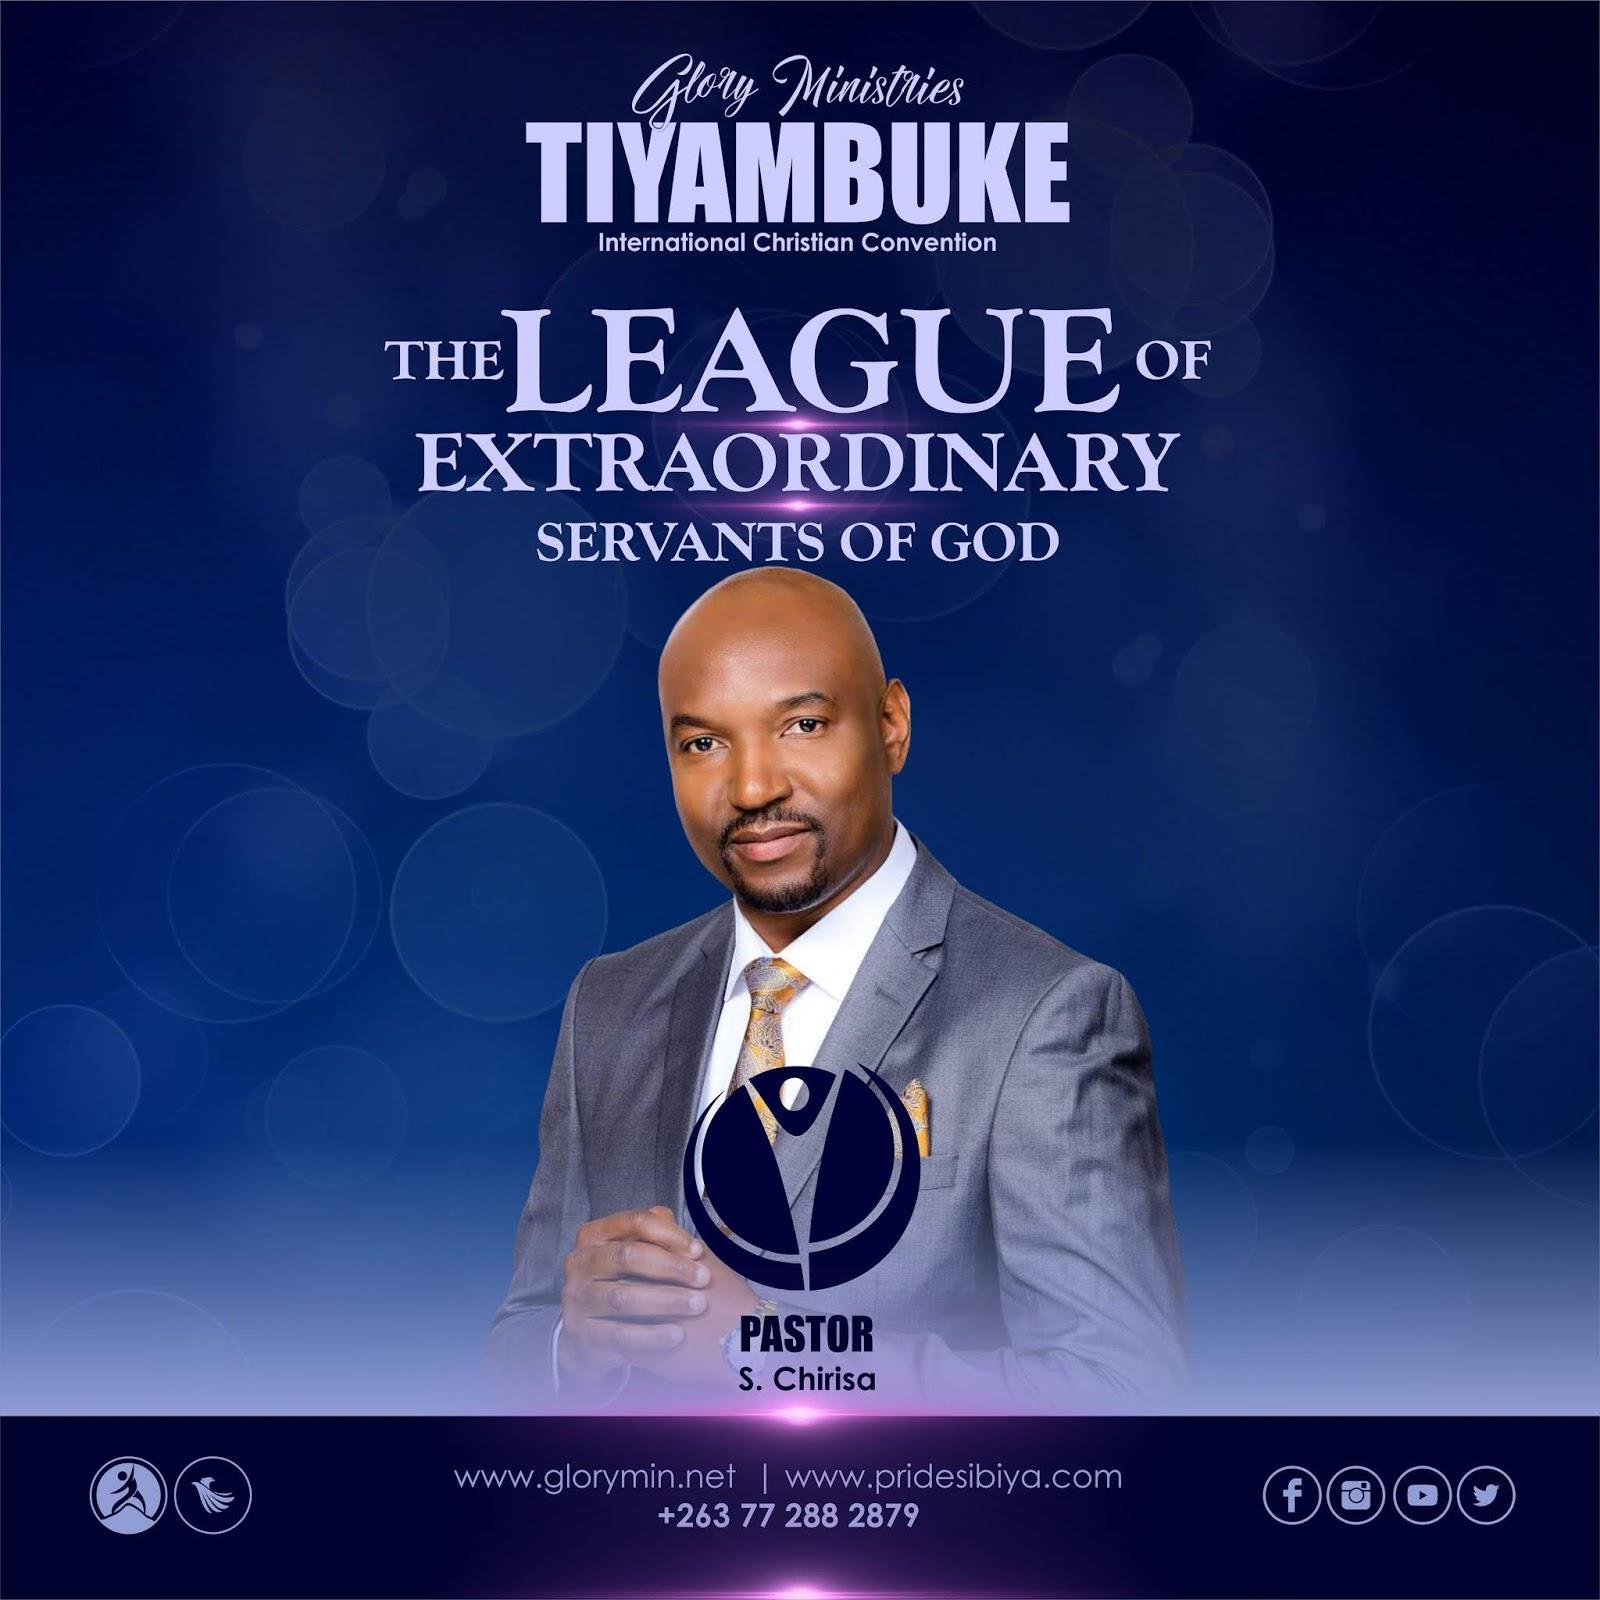 Doctor, Pastor S. Chirisa - The League Of Extra-Ordinary Servants Of God #Tiyambuke2019